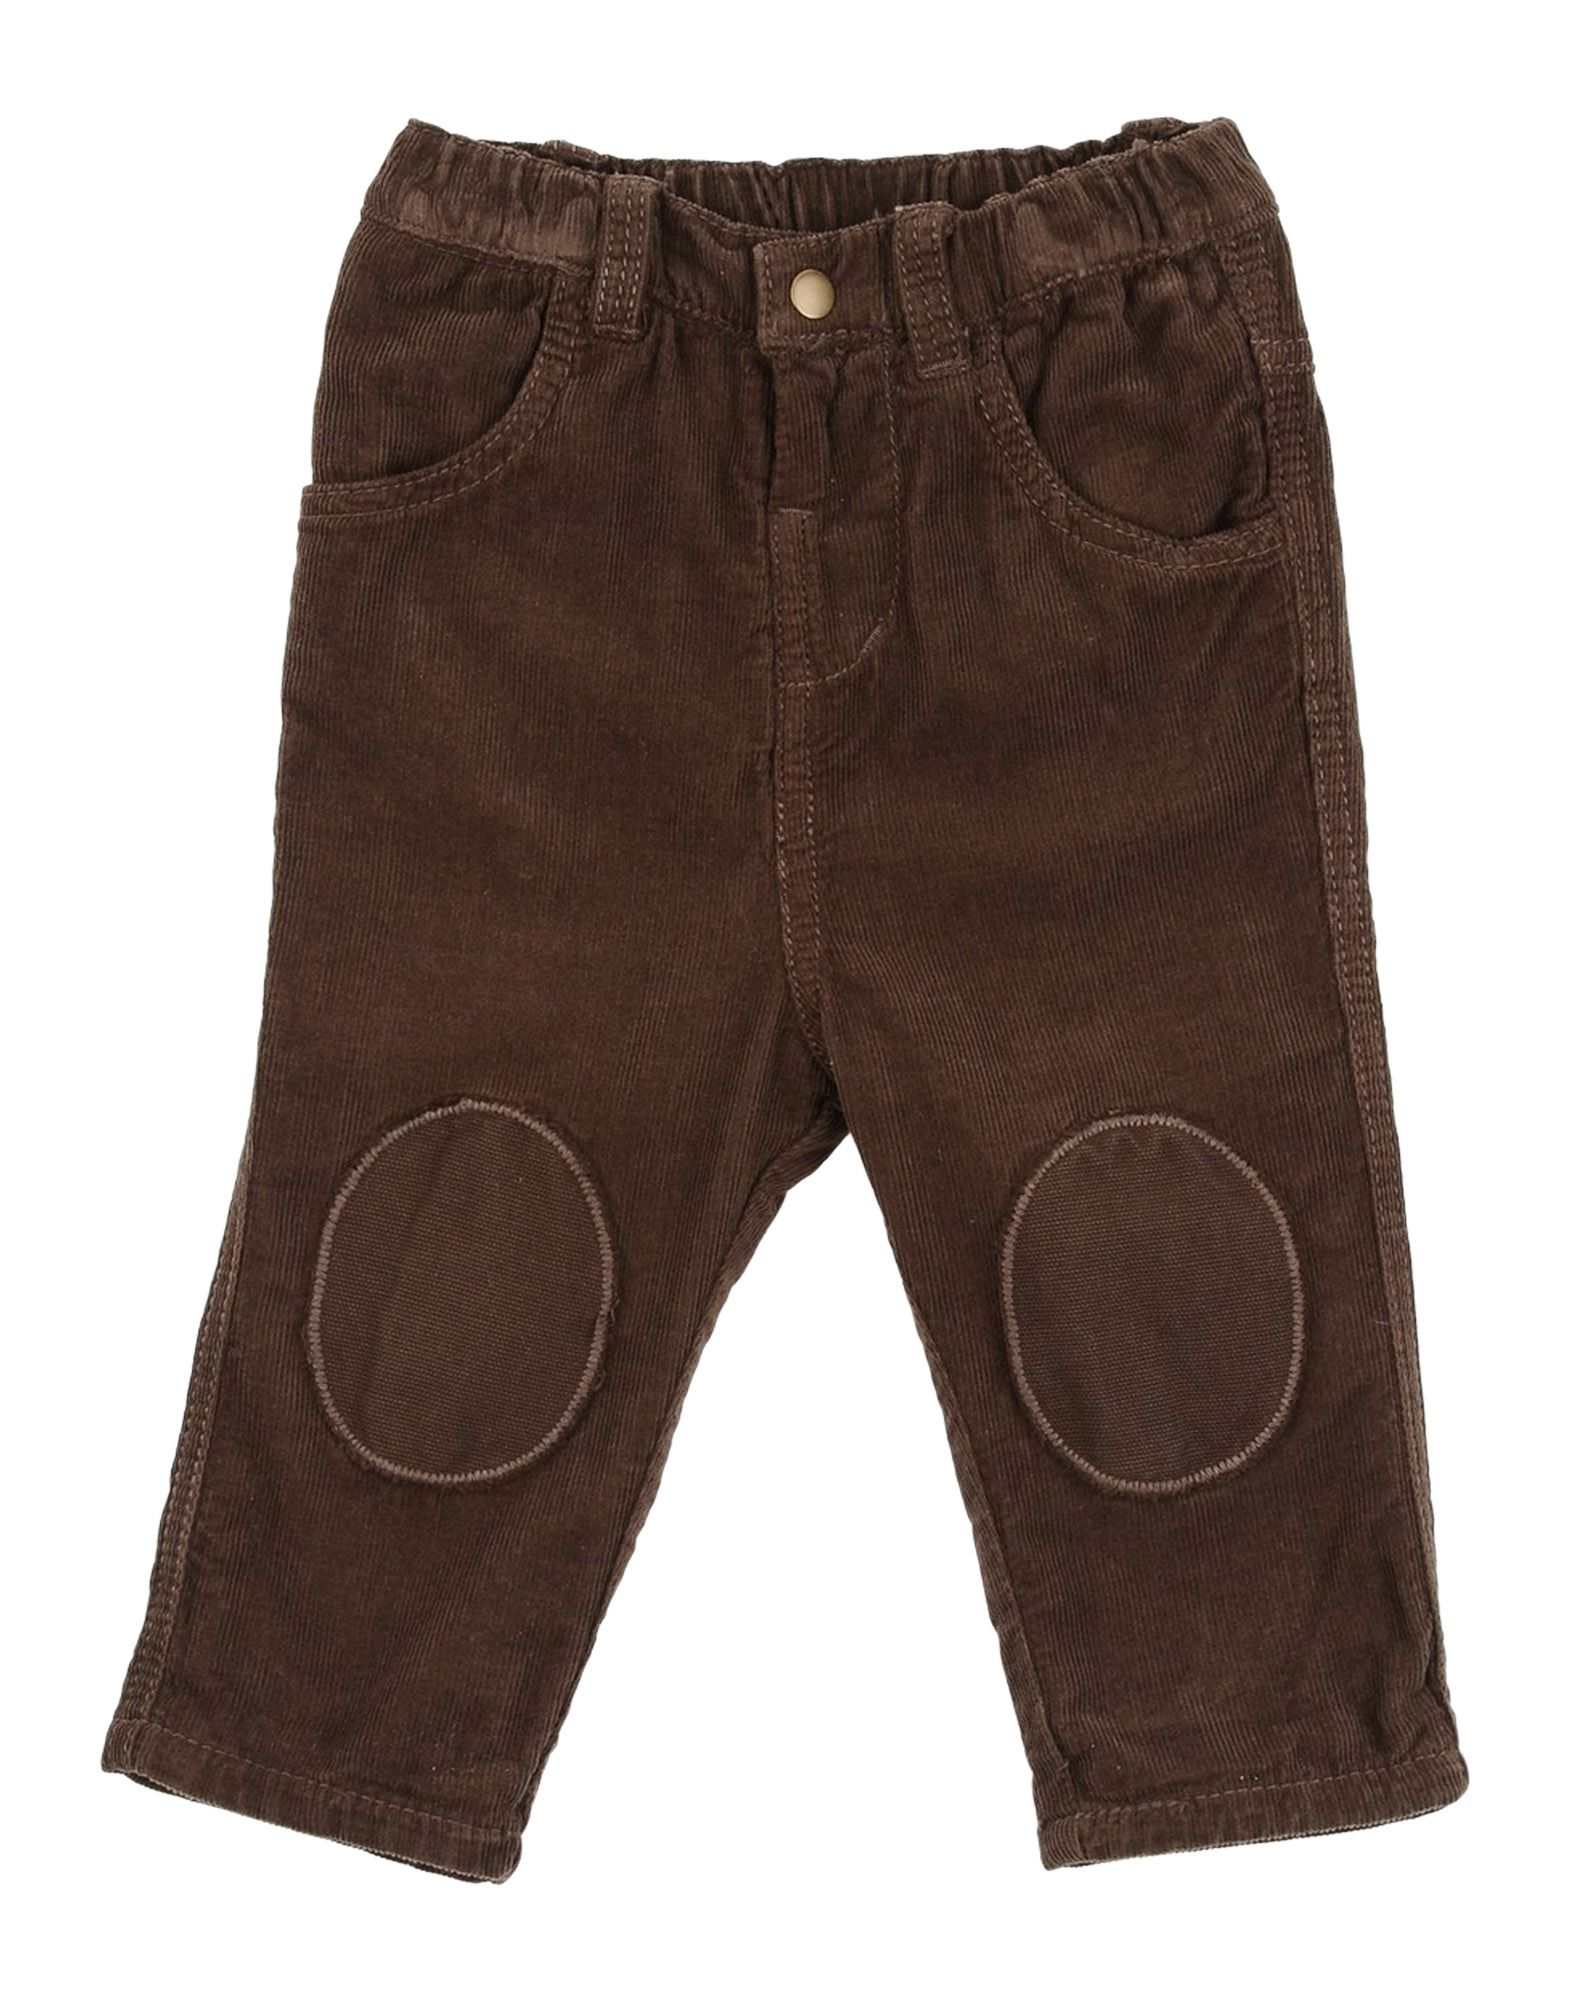 Pantalon taille 0 by eliane et lena garçon....